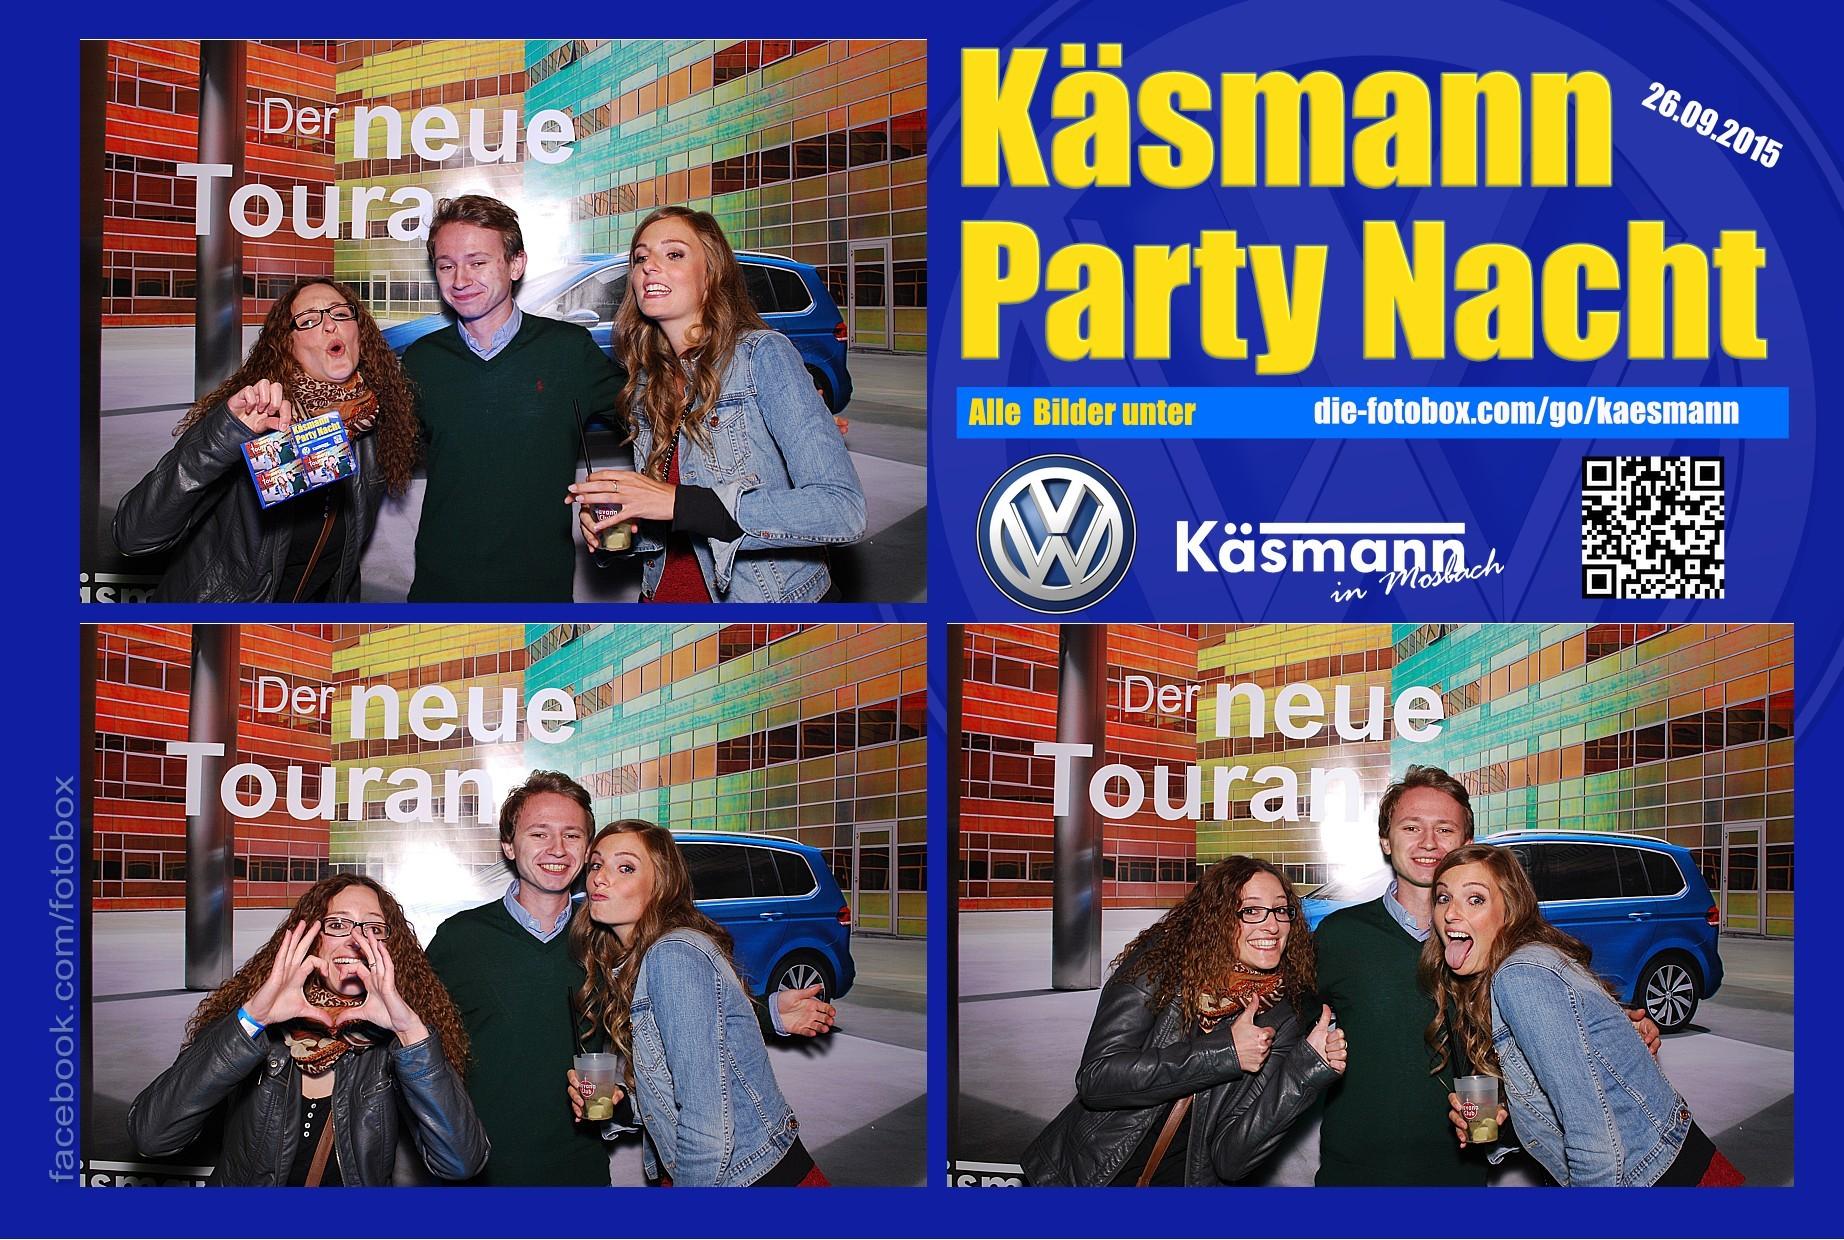 Käsmannparty 2015 - www.die-fotobox.com 01104